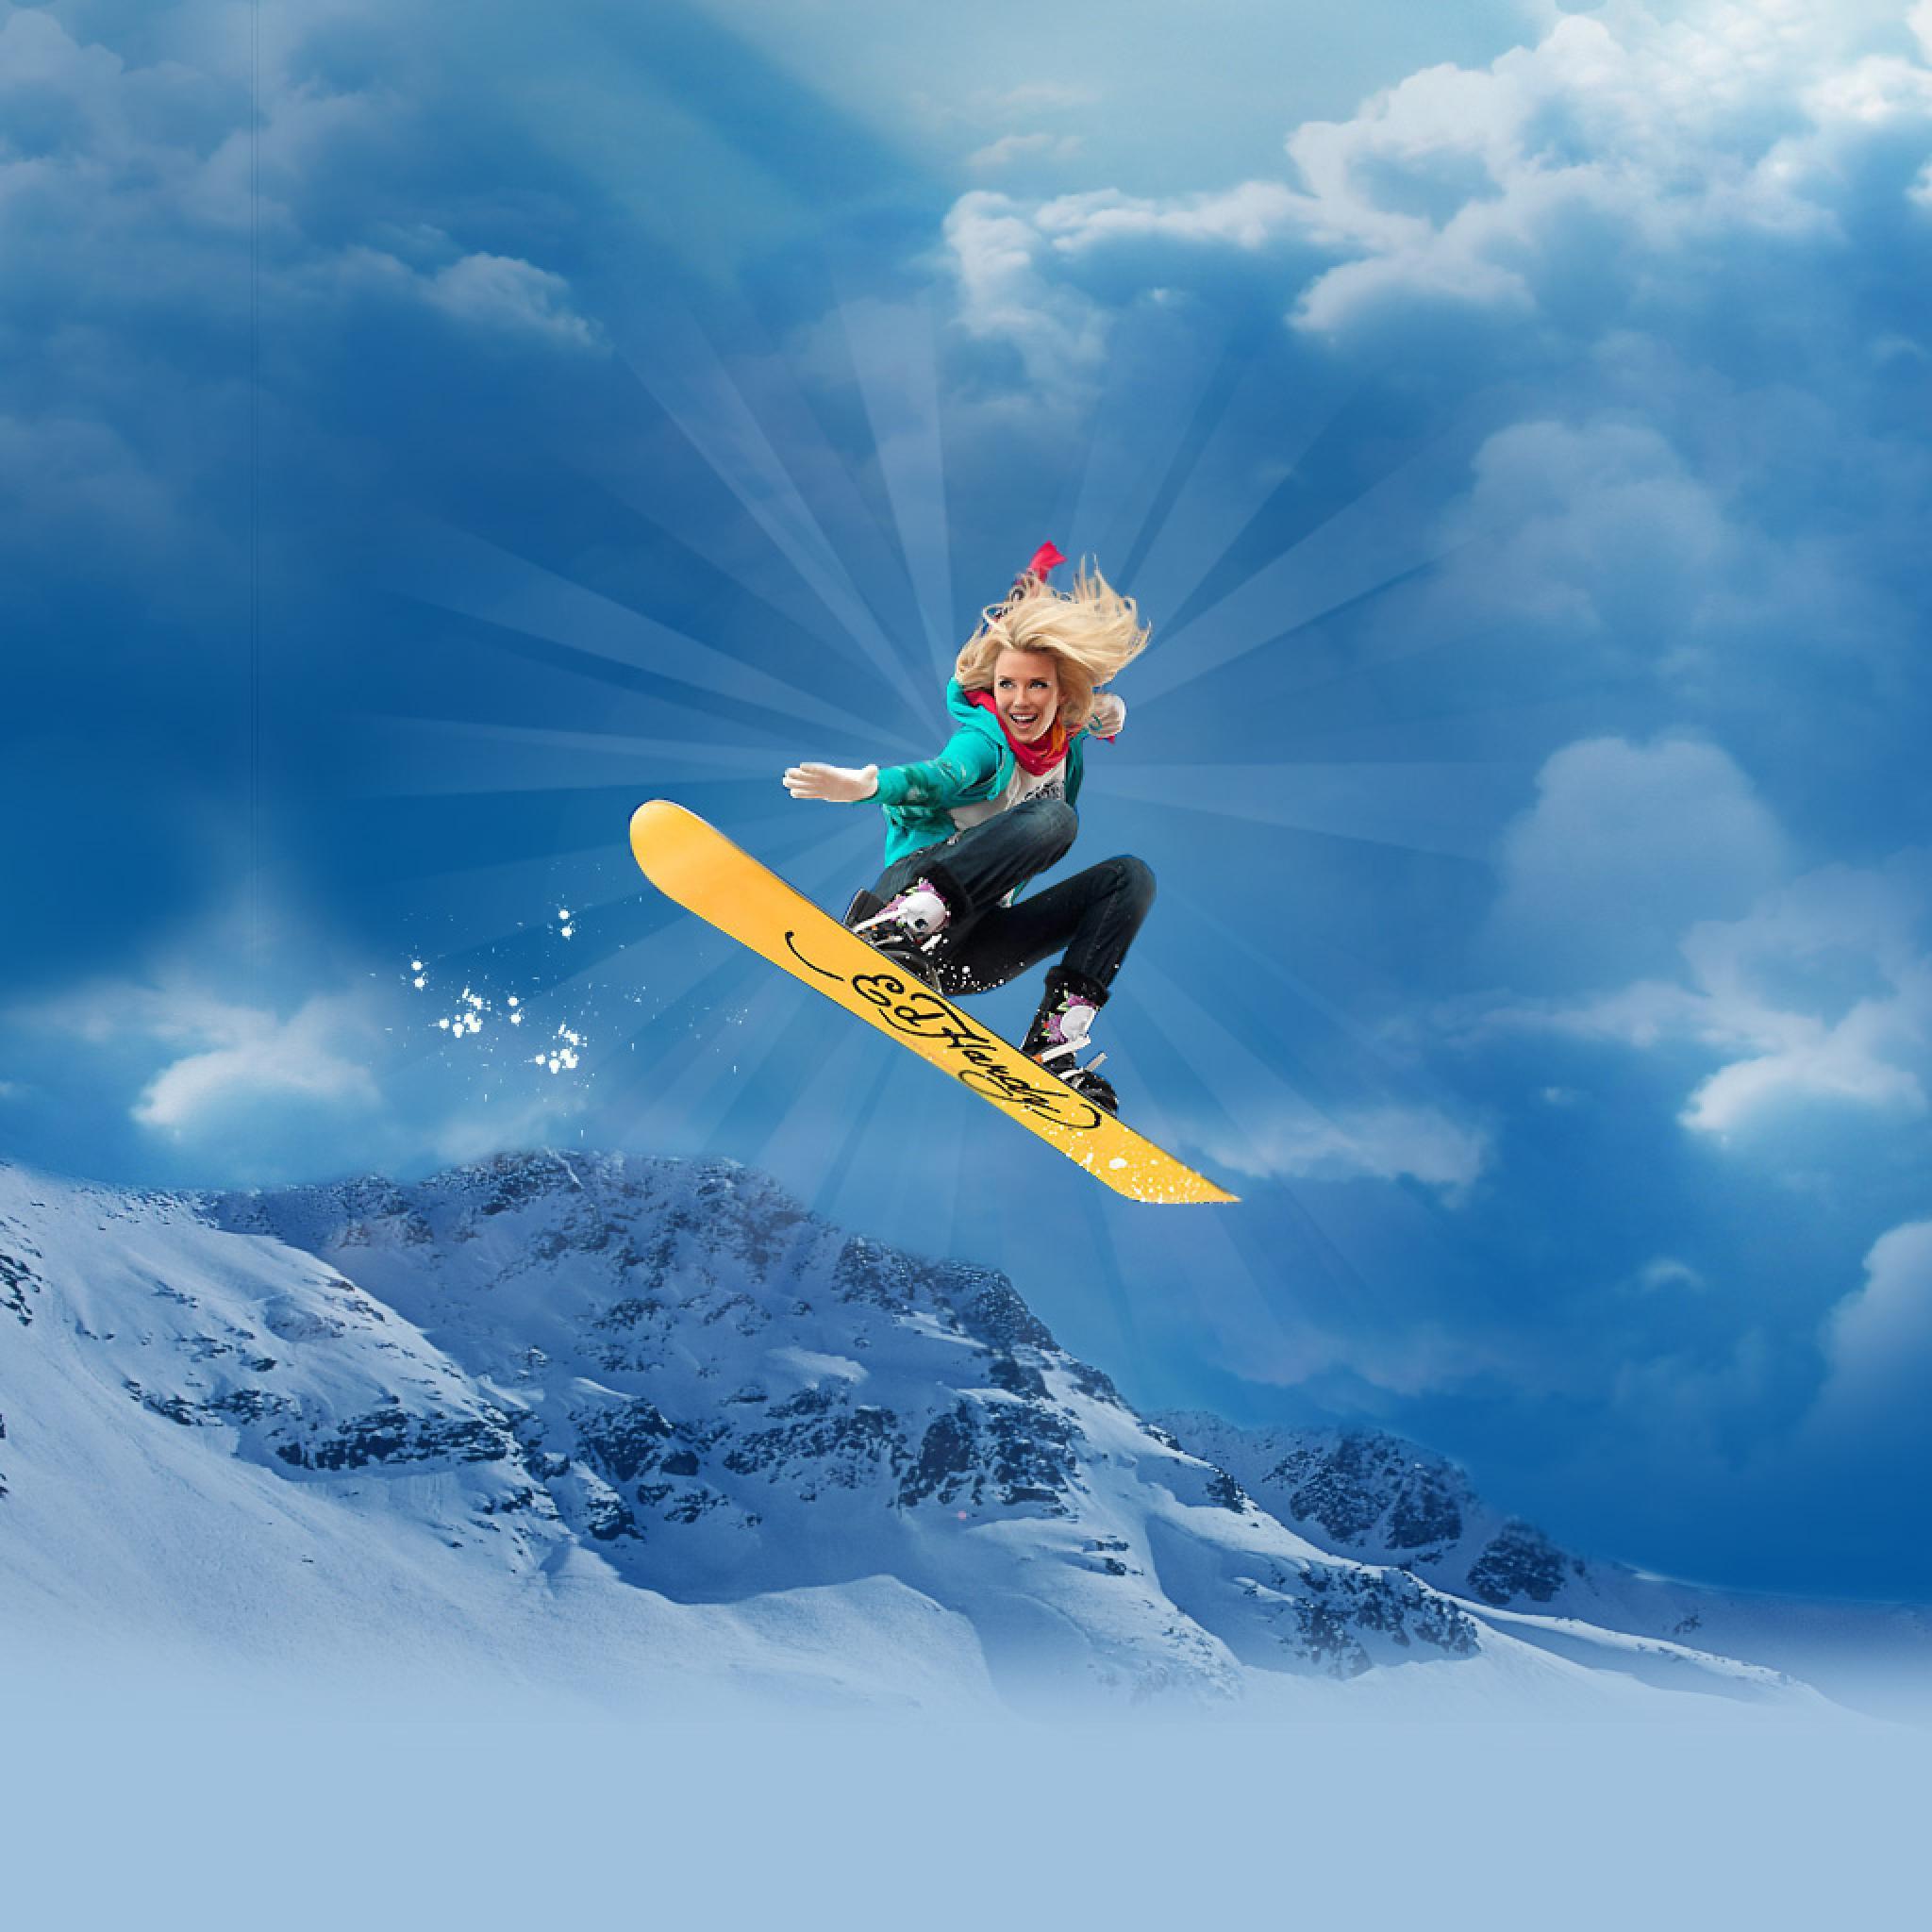 Reef Girl Wallpaper Vector Hottest Snowboard Girl Style Ipad Iphone Hd